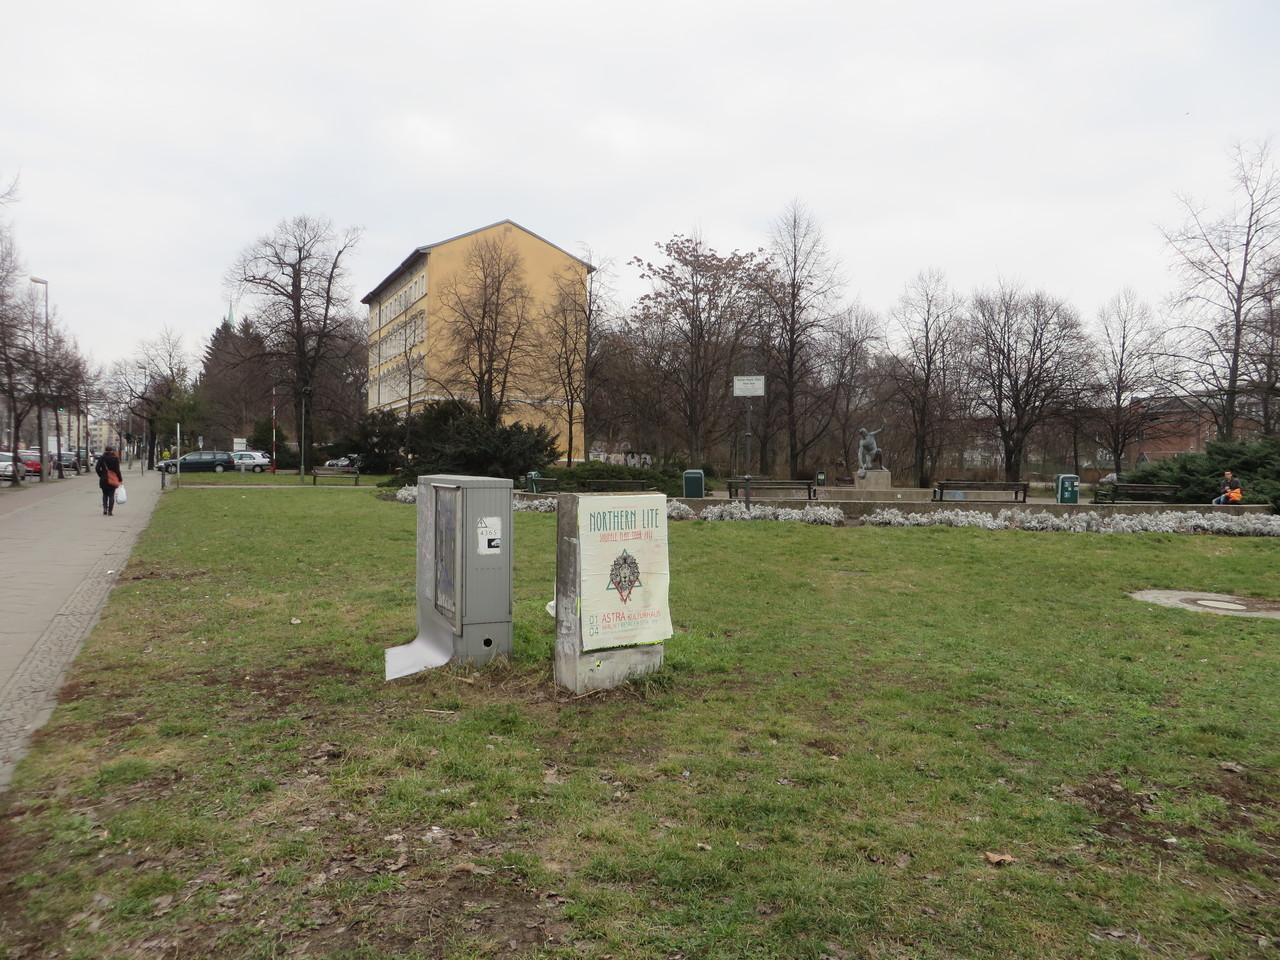 am_rathausplatz_lichtt5s9j.jpg